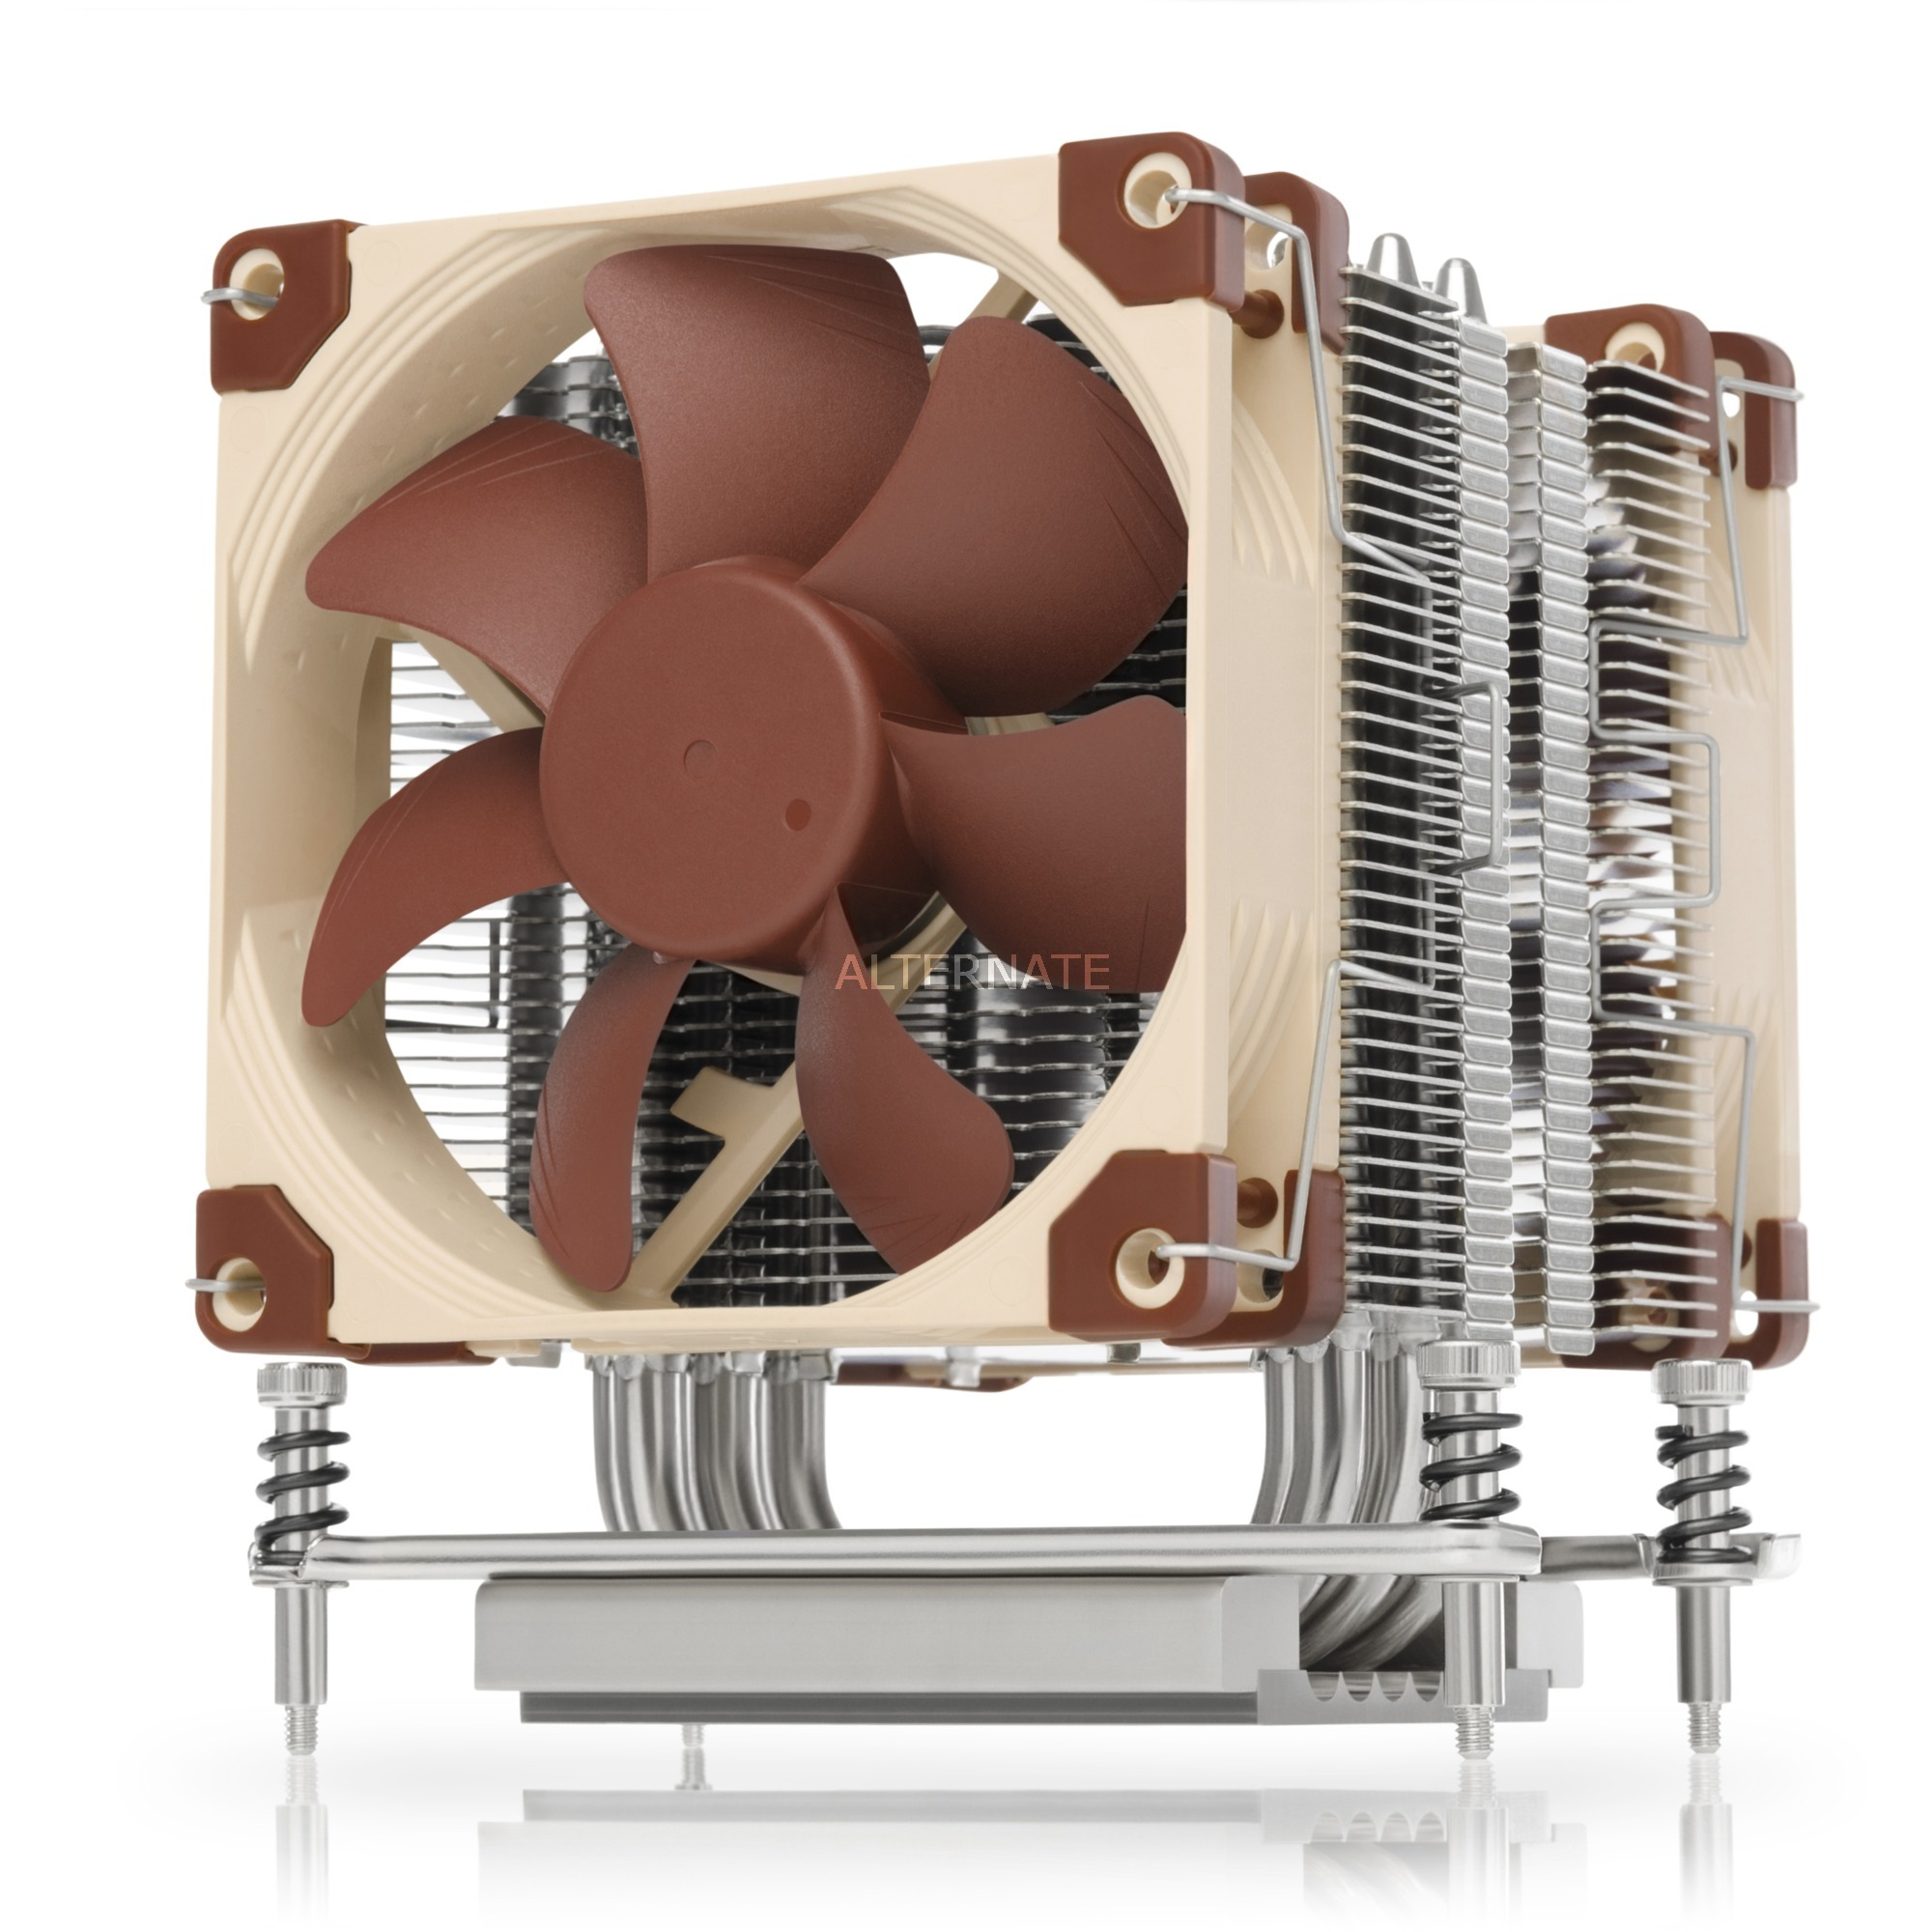 NH-U9 TR4-SP3 Processeur Refroidisseur ventilateur, refroidisseur et radiateur, Ventirad